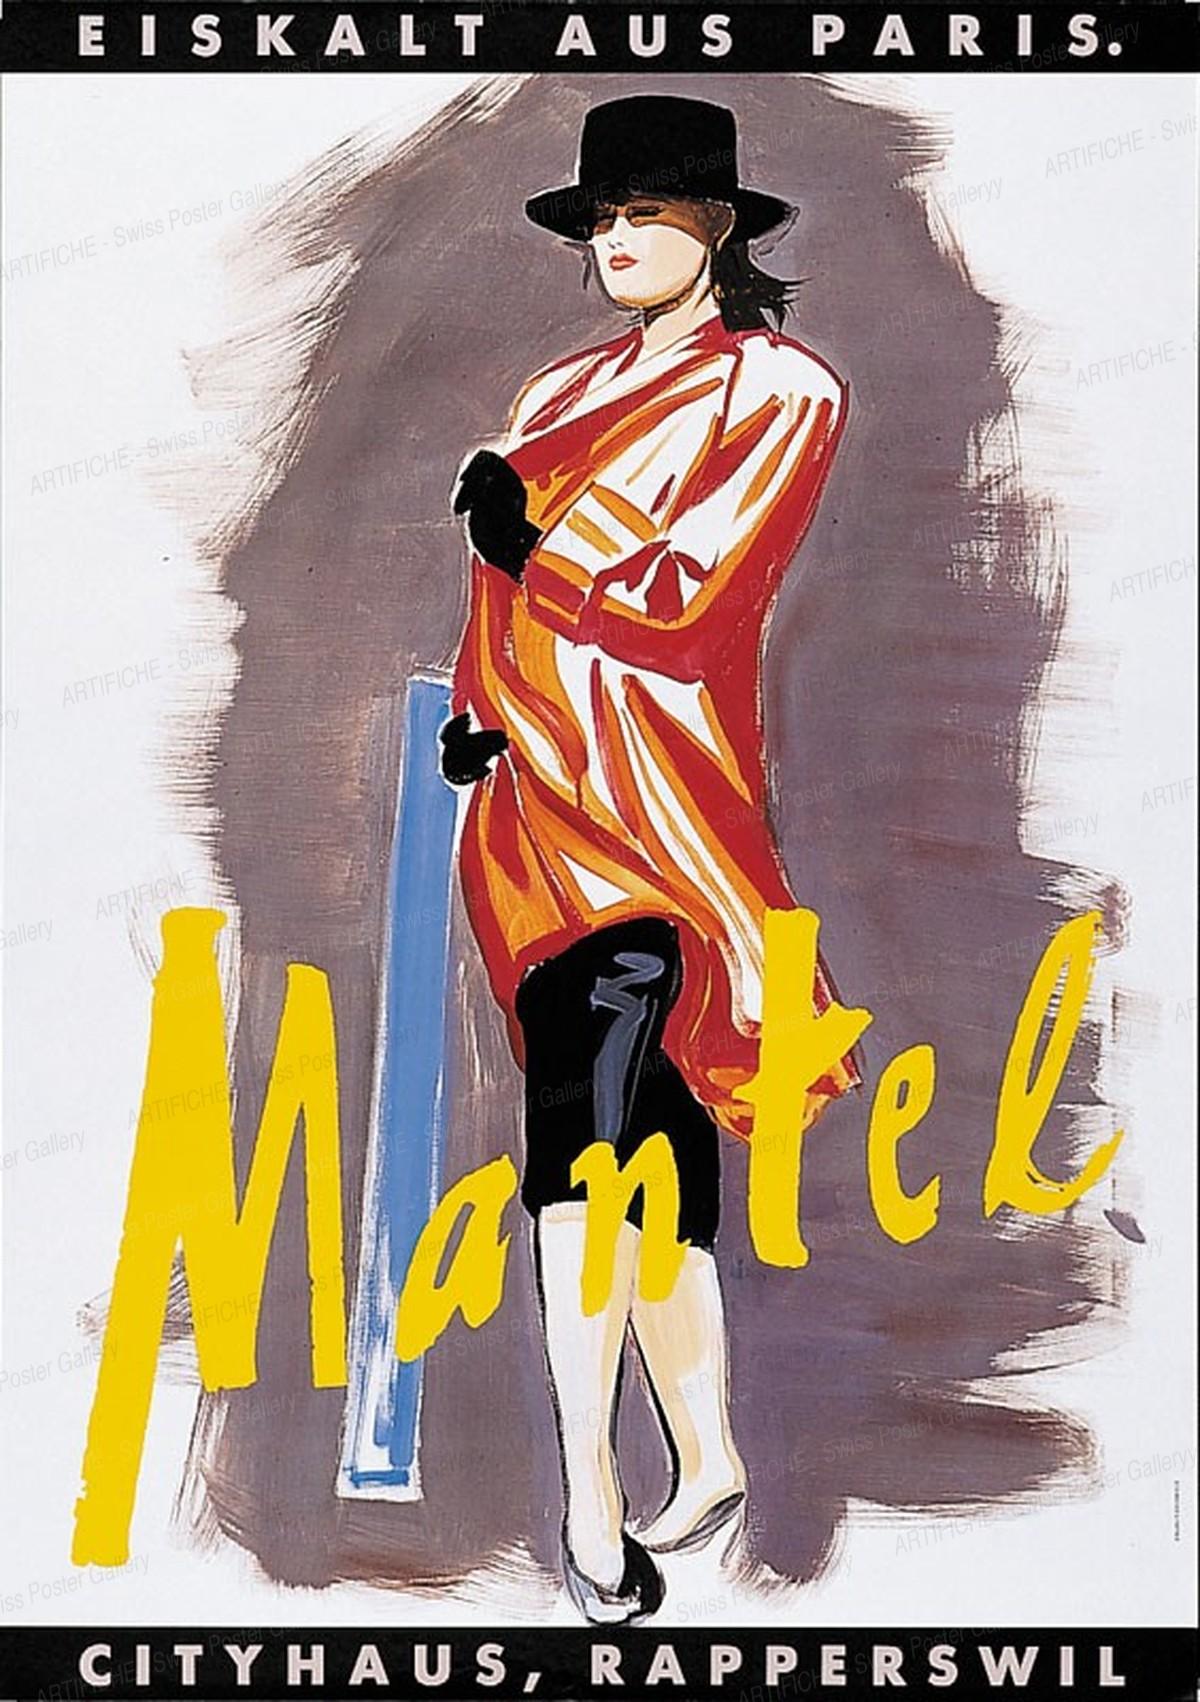 Cityhaus Mantel Fashion Store. Freezing from Paris., Rémy Fabrikant